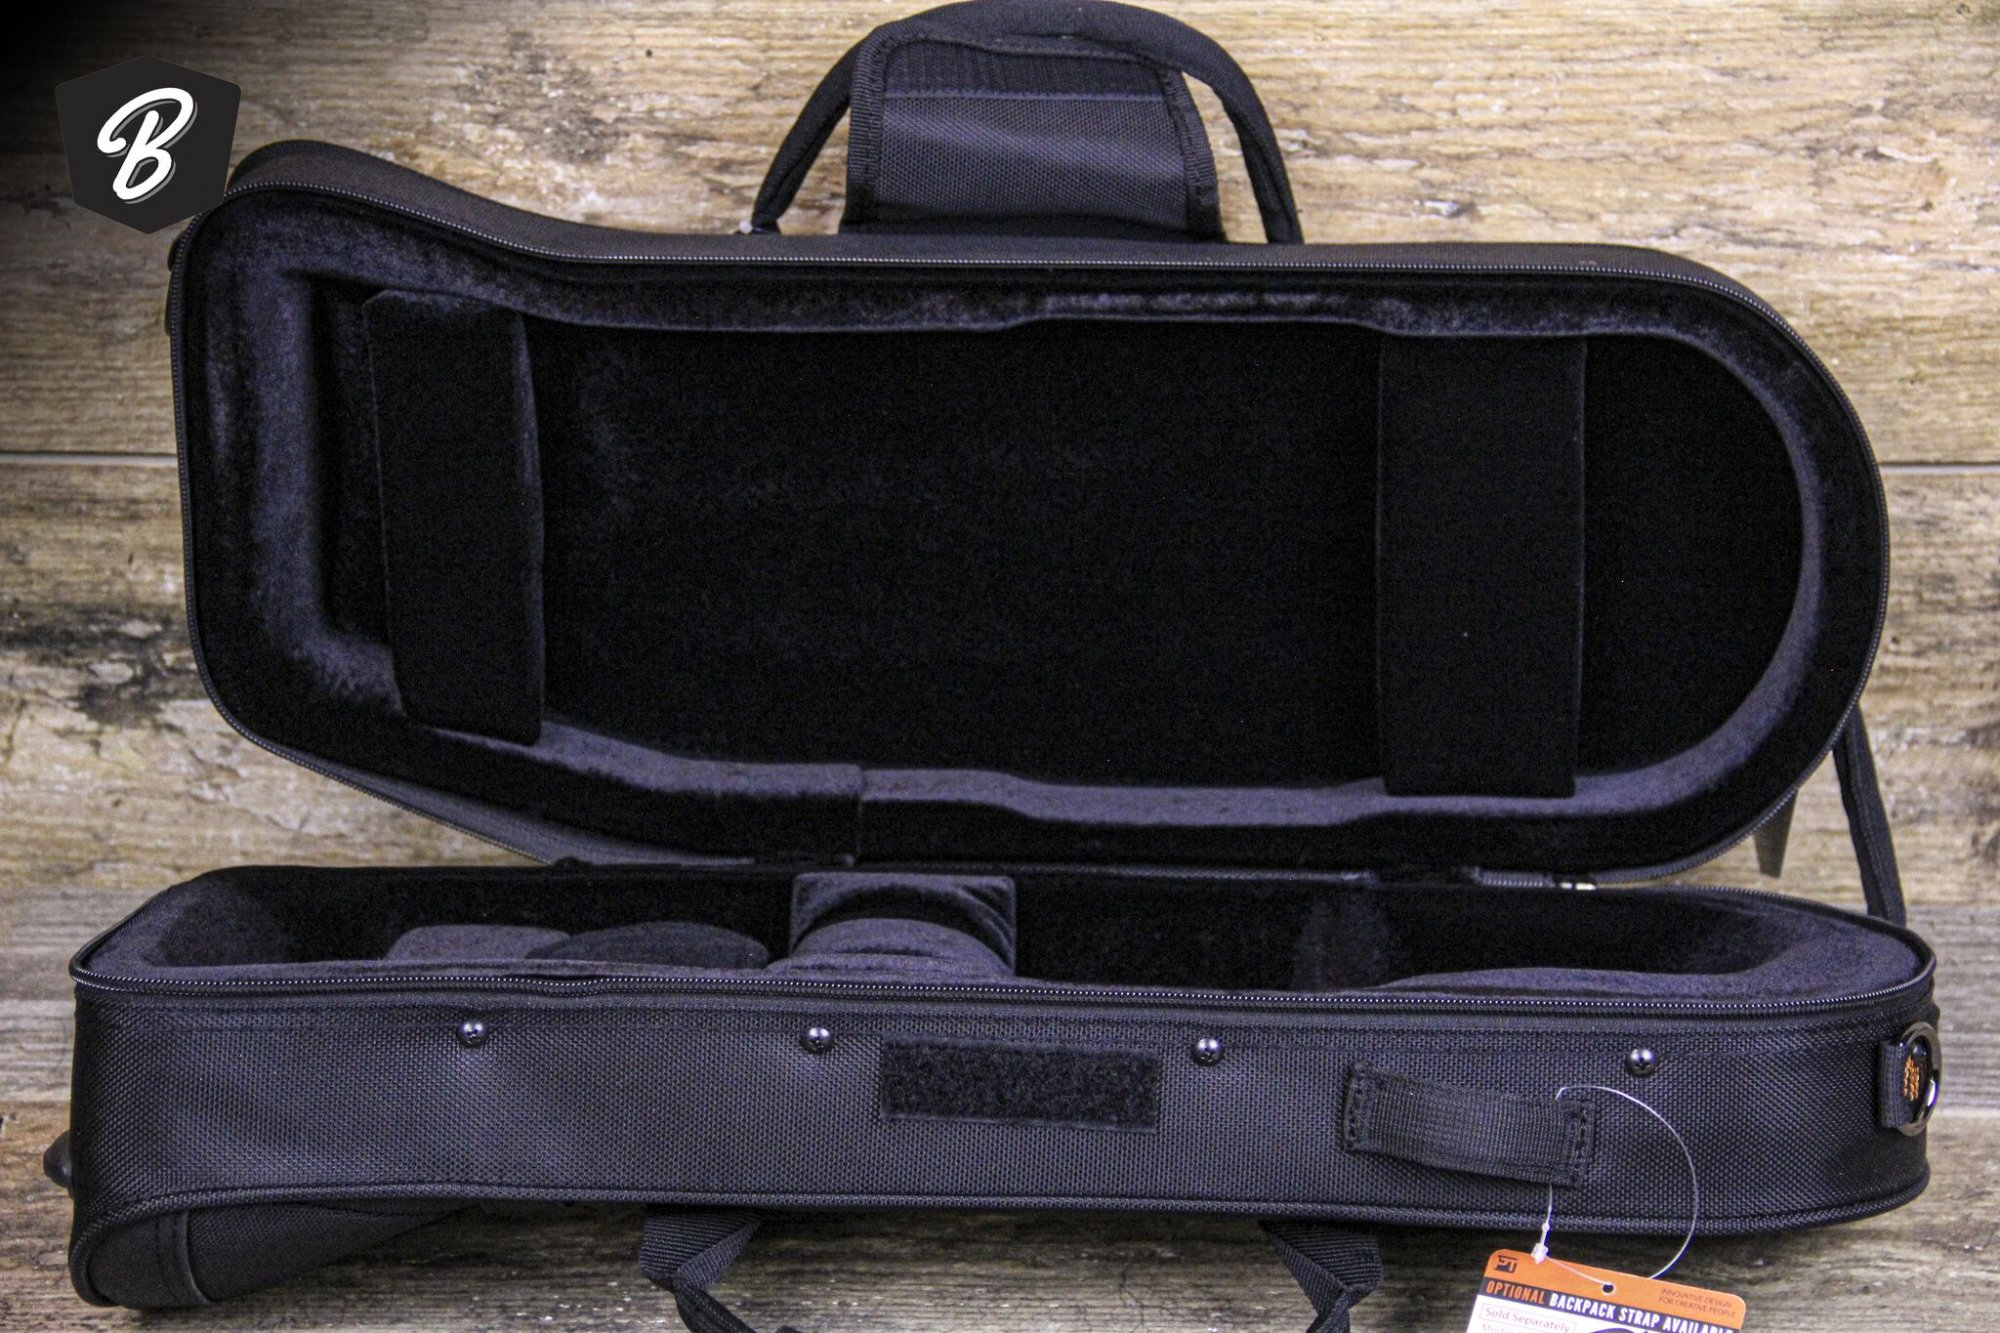 Protec Pro Pac Travel Light Trumpet Case PB301TL